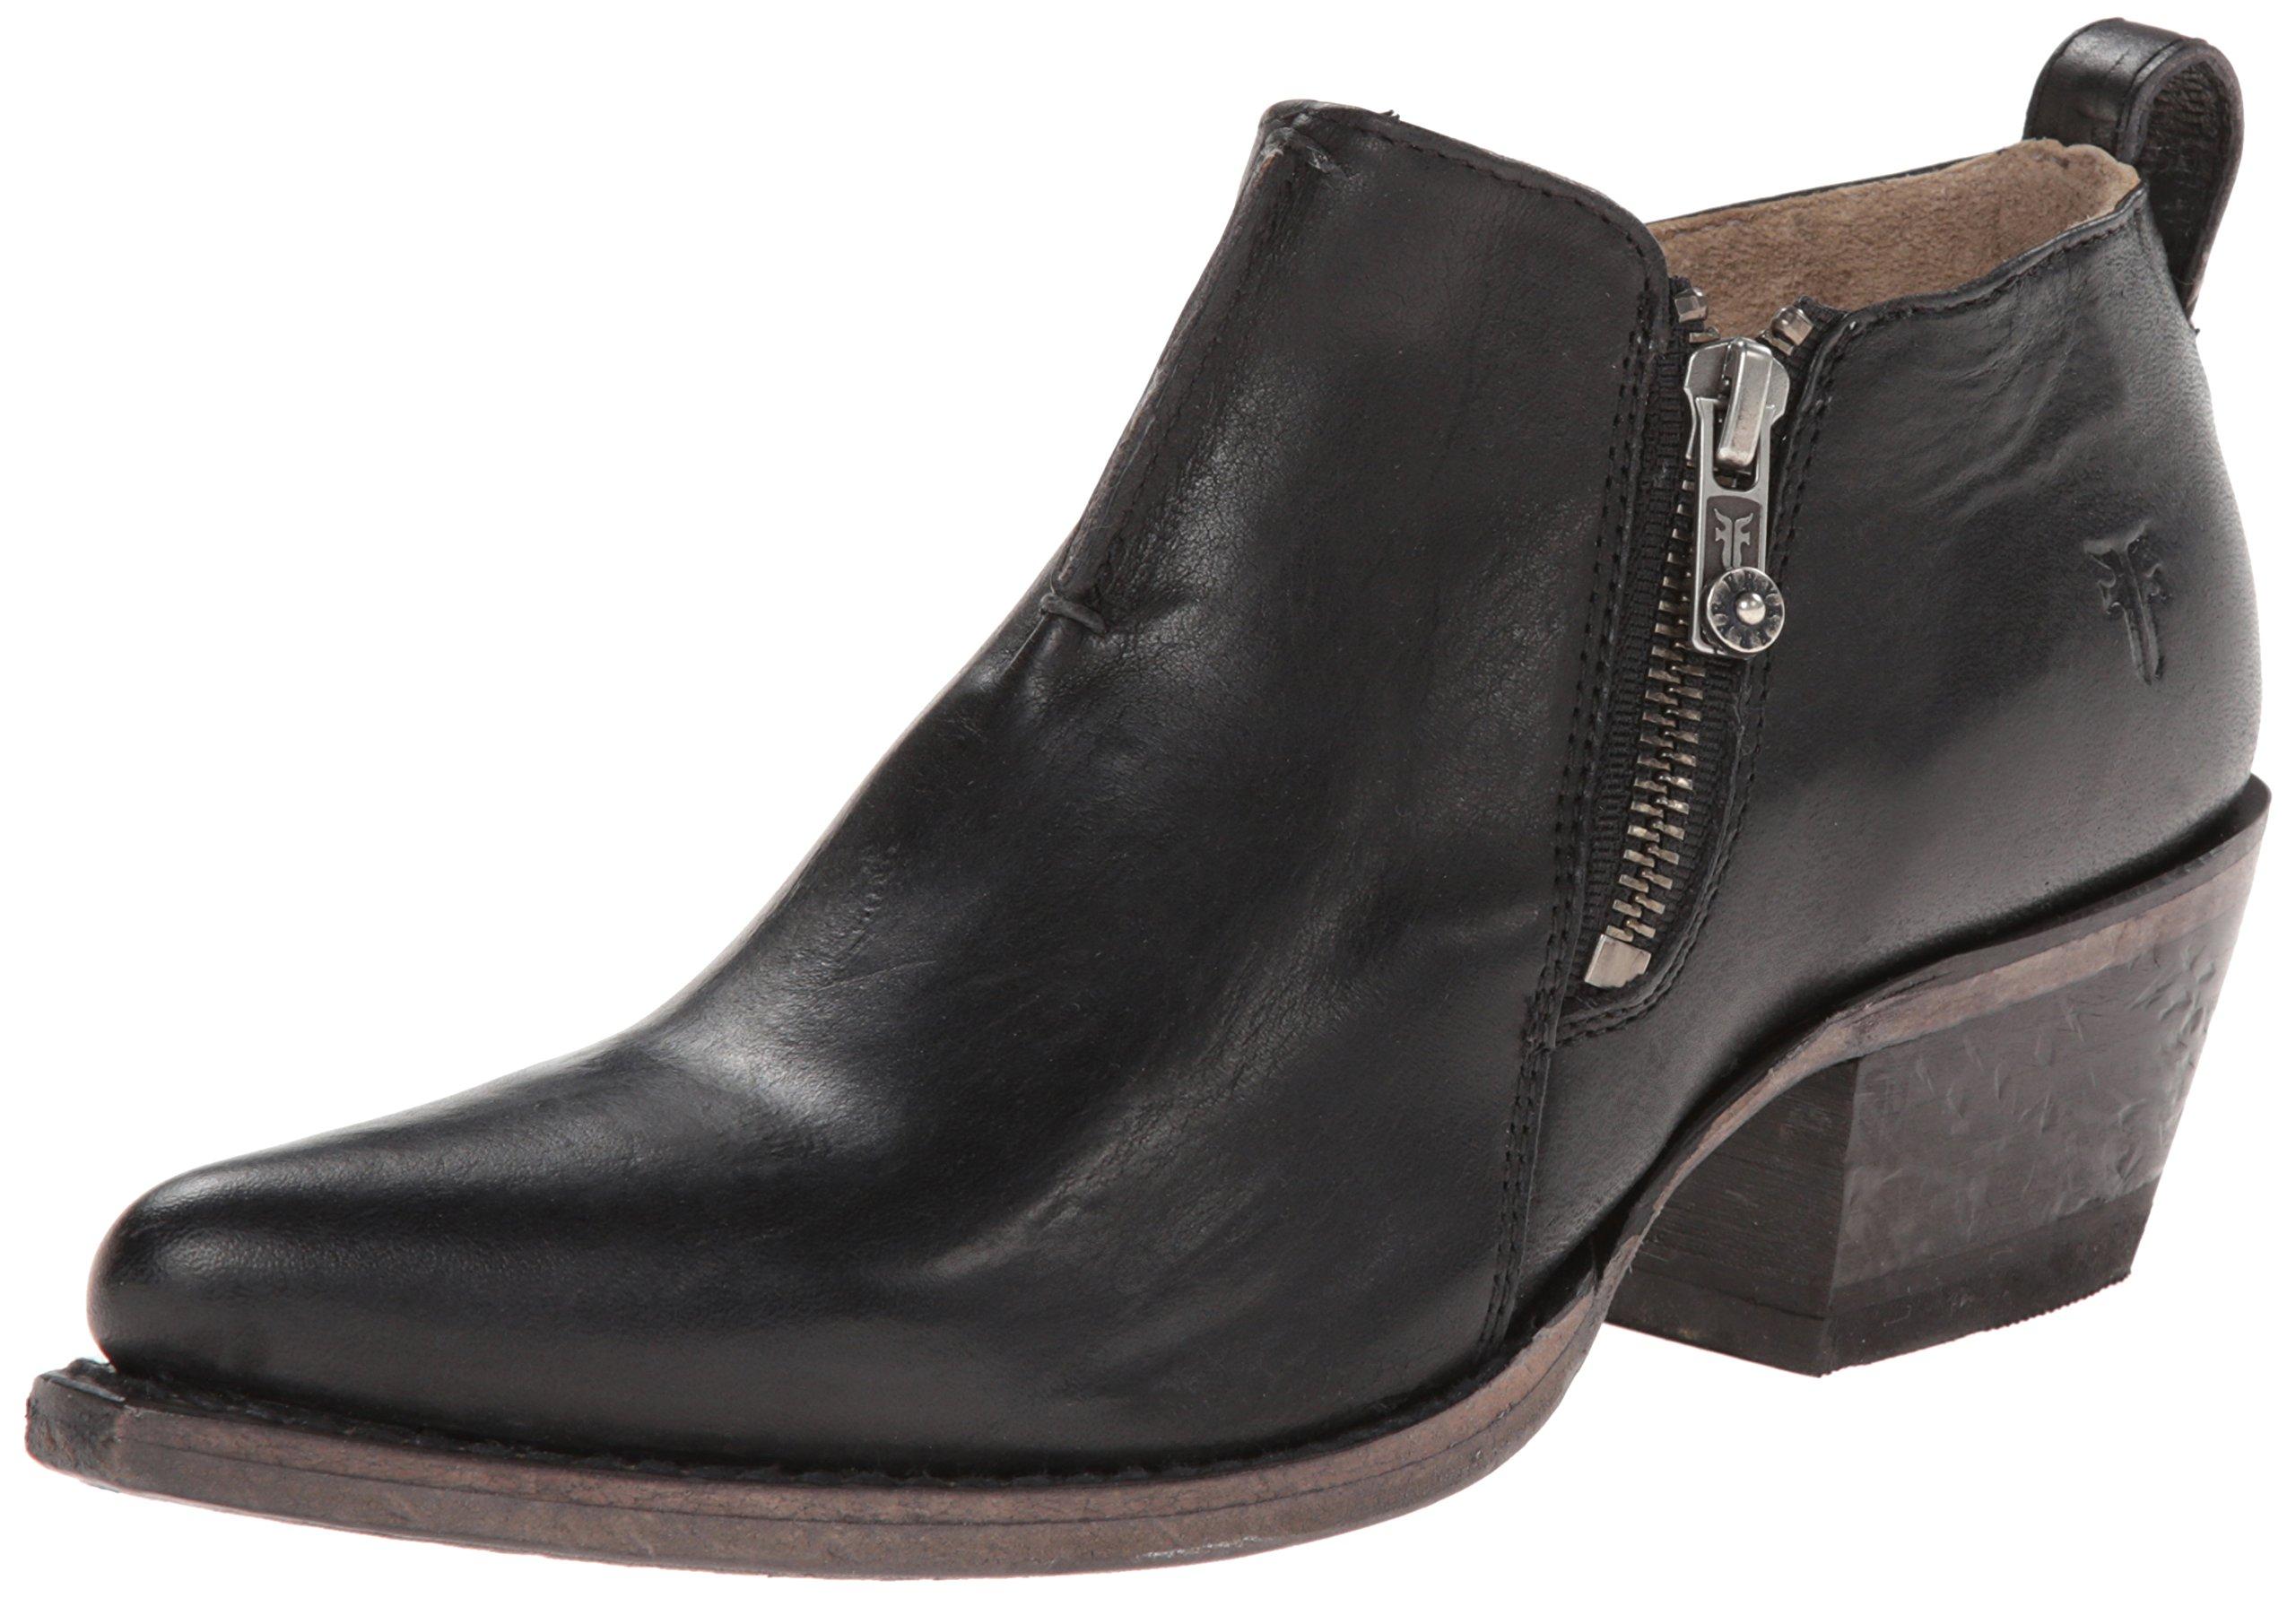 FRYE Women's Sacha Moto Shootie Western Boot, Black, 8 M US